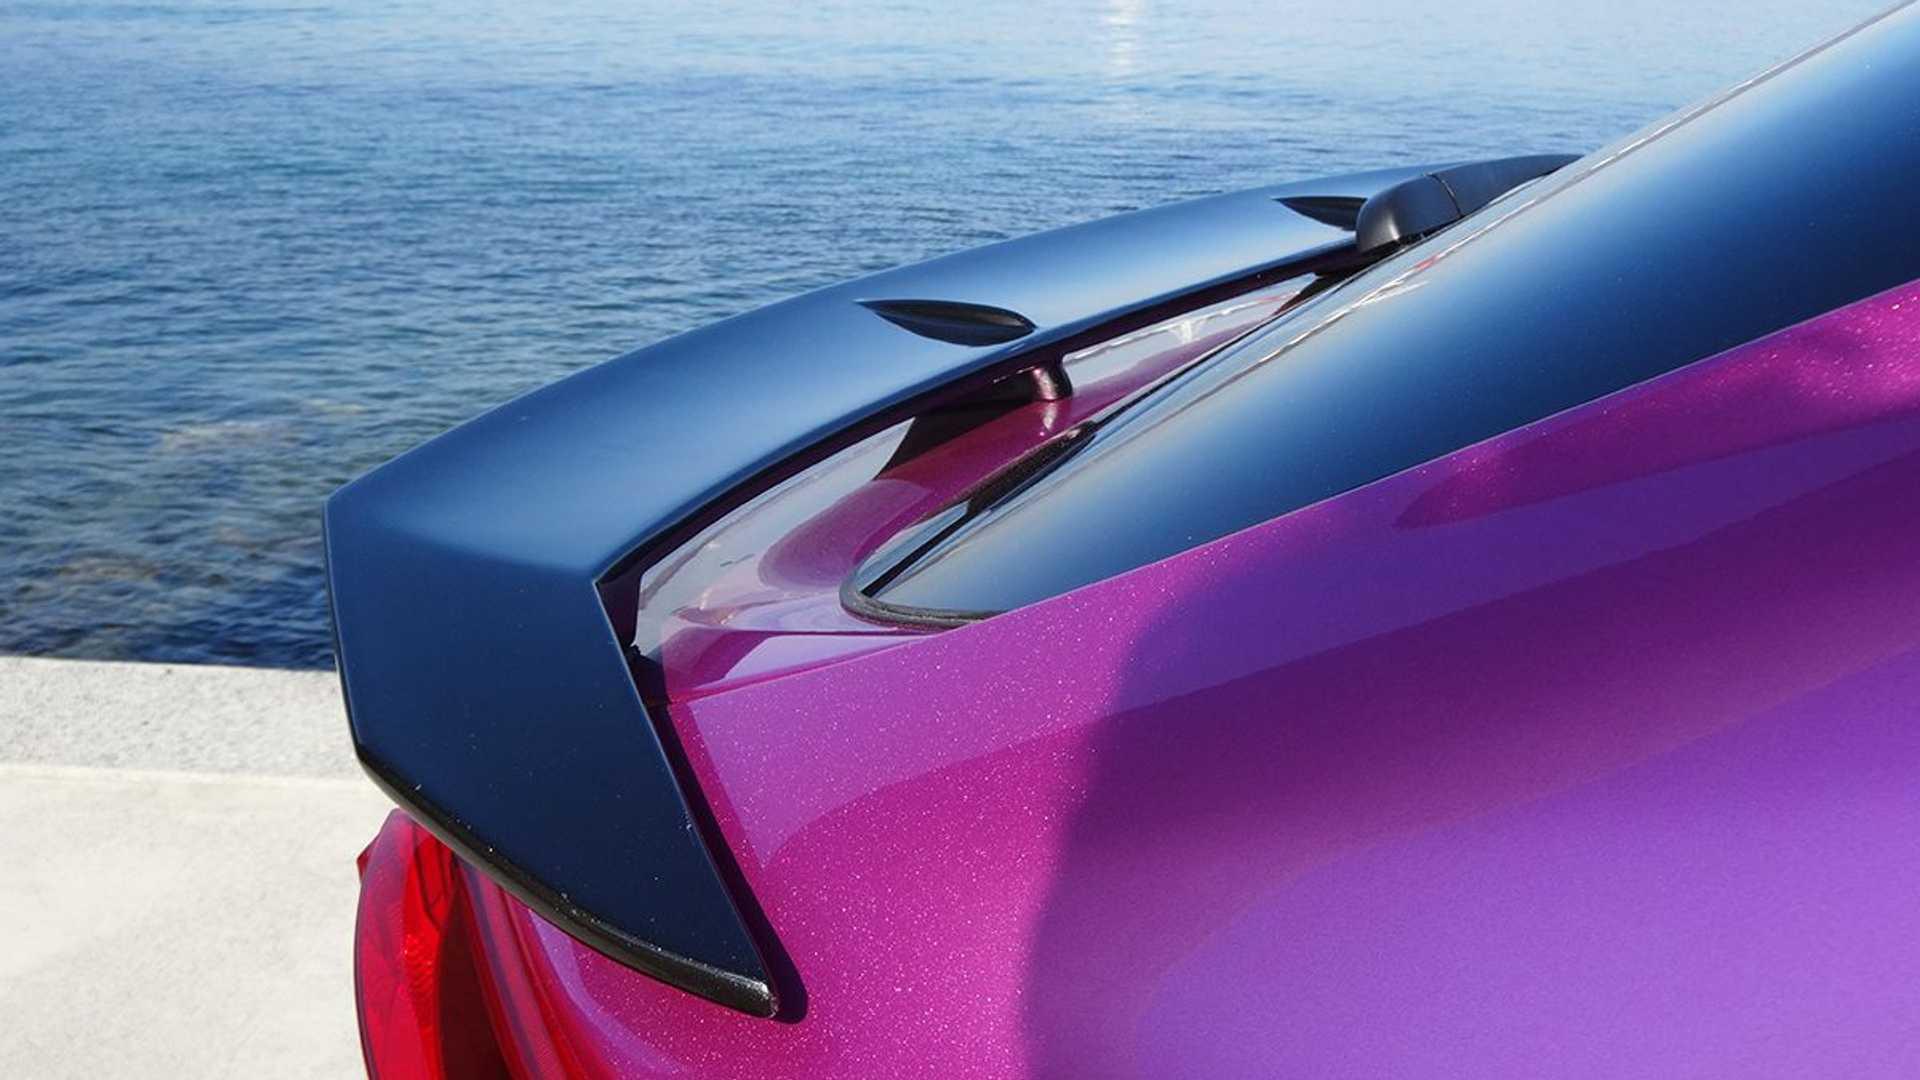 Toyota Venza Lamborghini Urus Body Kit By Albermo Wing